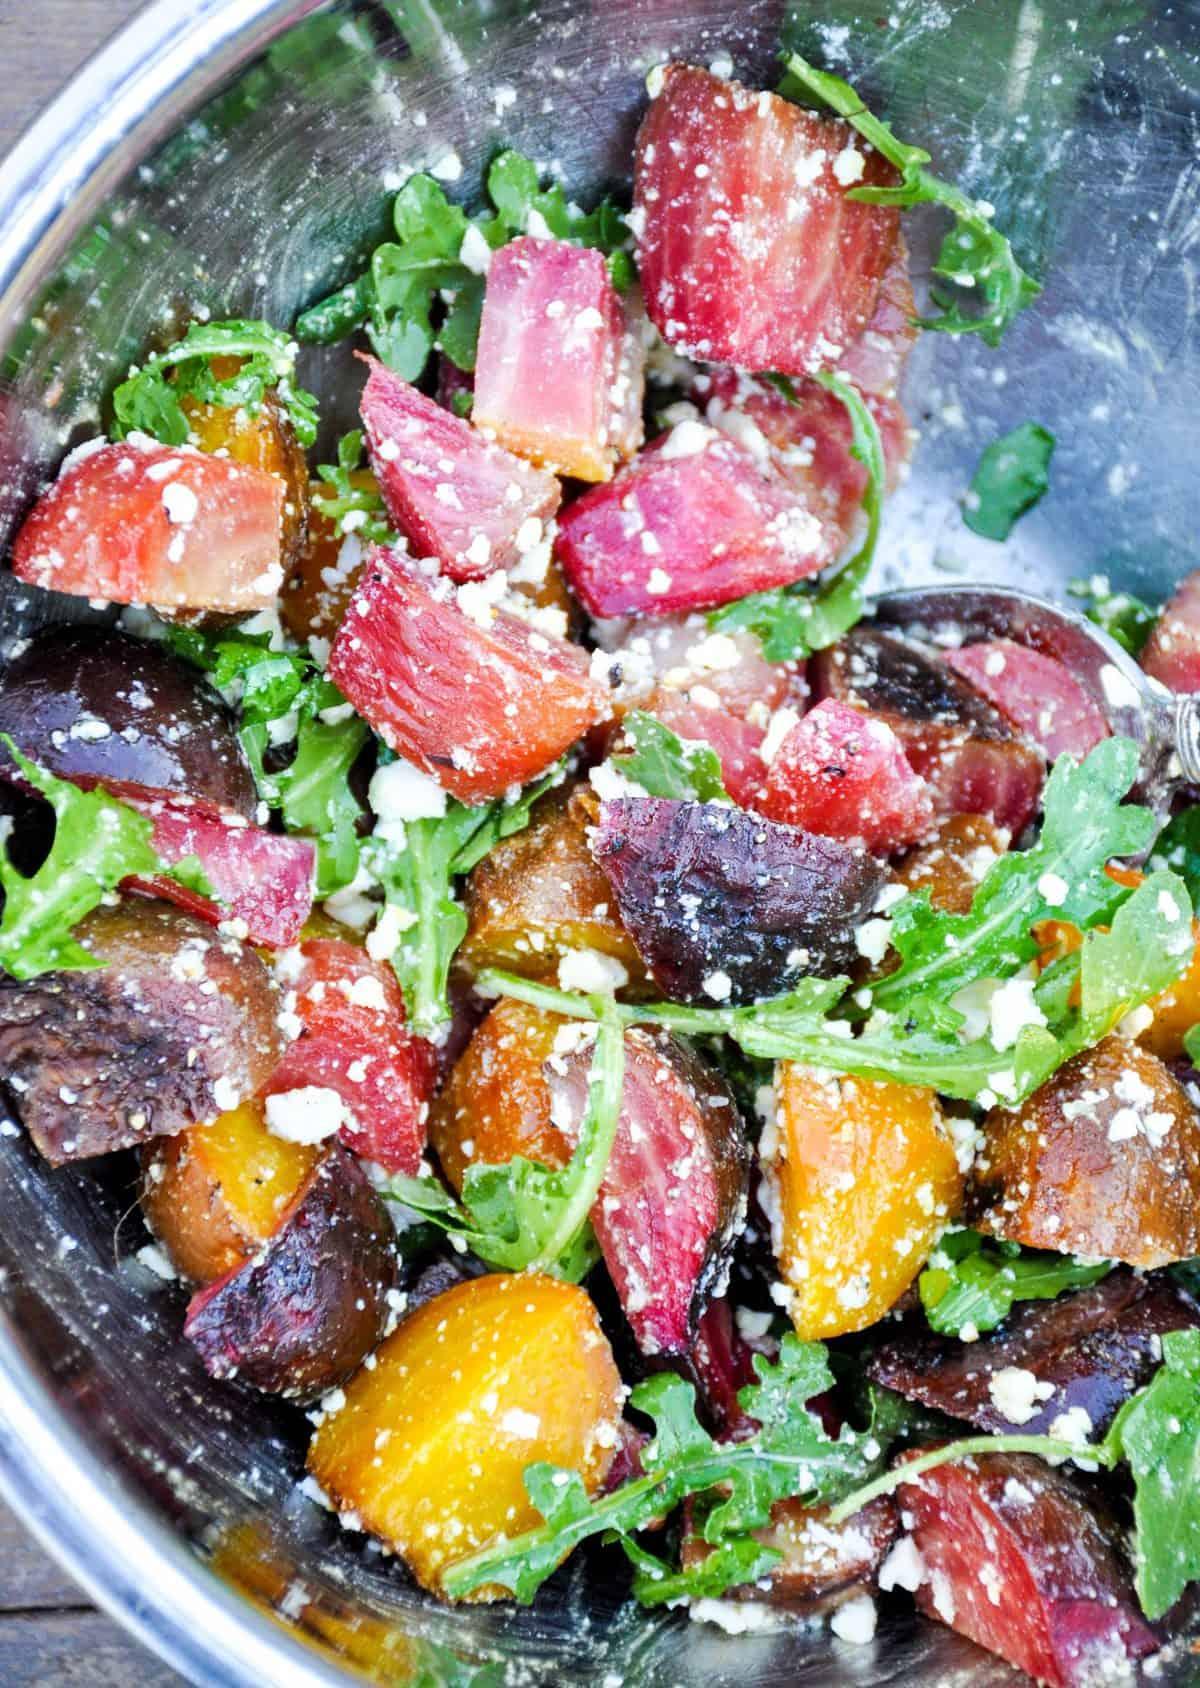 tossing beet salad